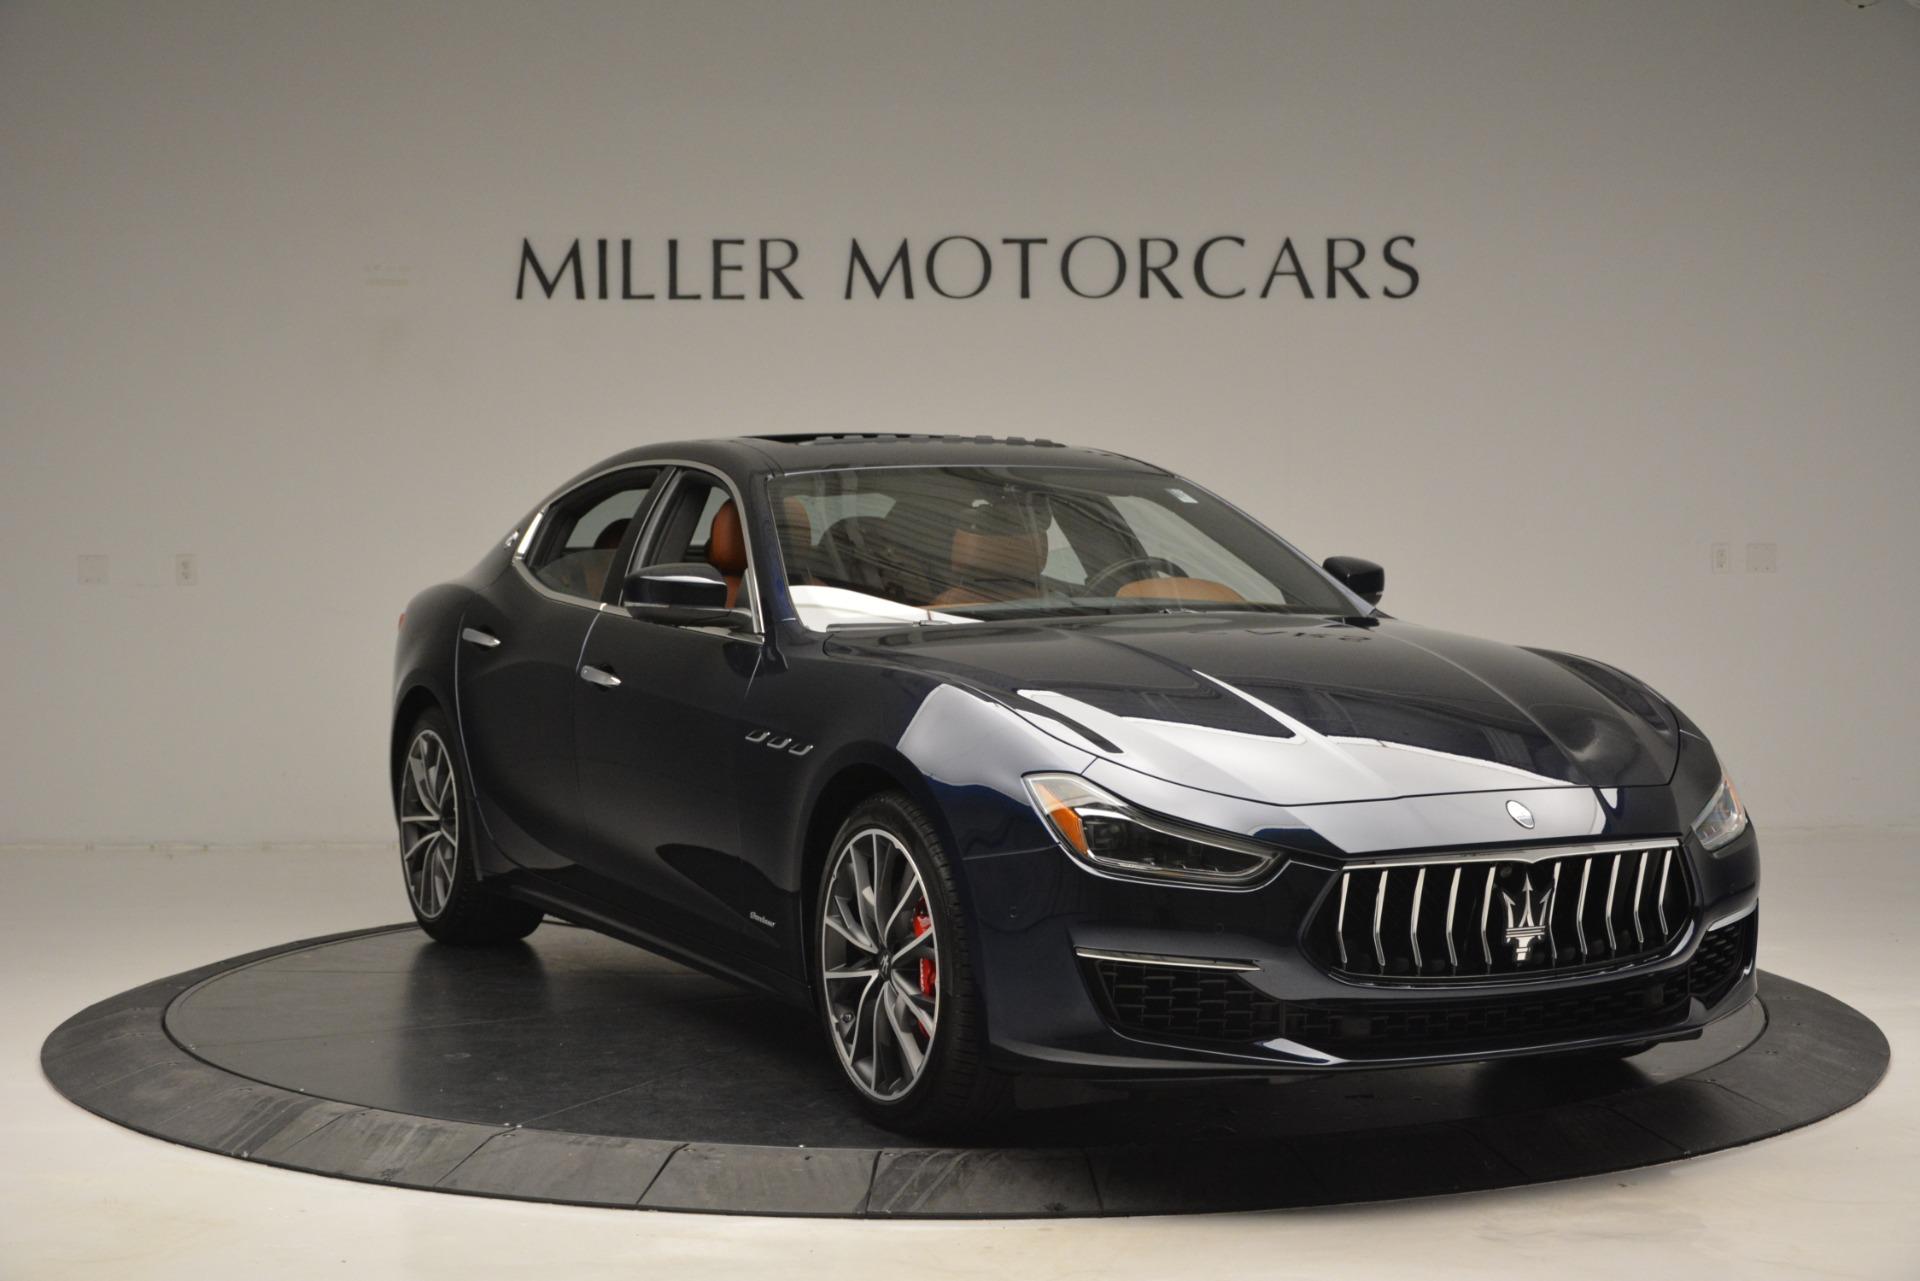 New 2019 Maserati Ghibli S Q4 GranSport For Sale In Greenwich, CT 2948_p16